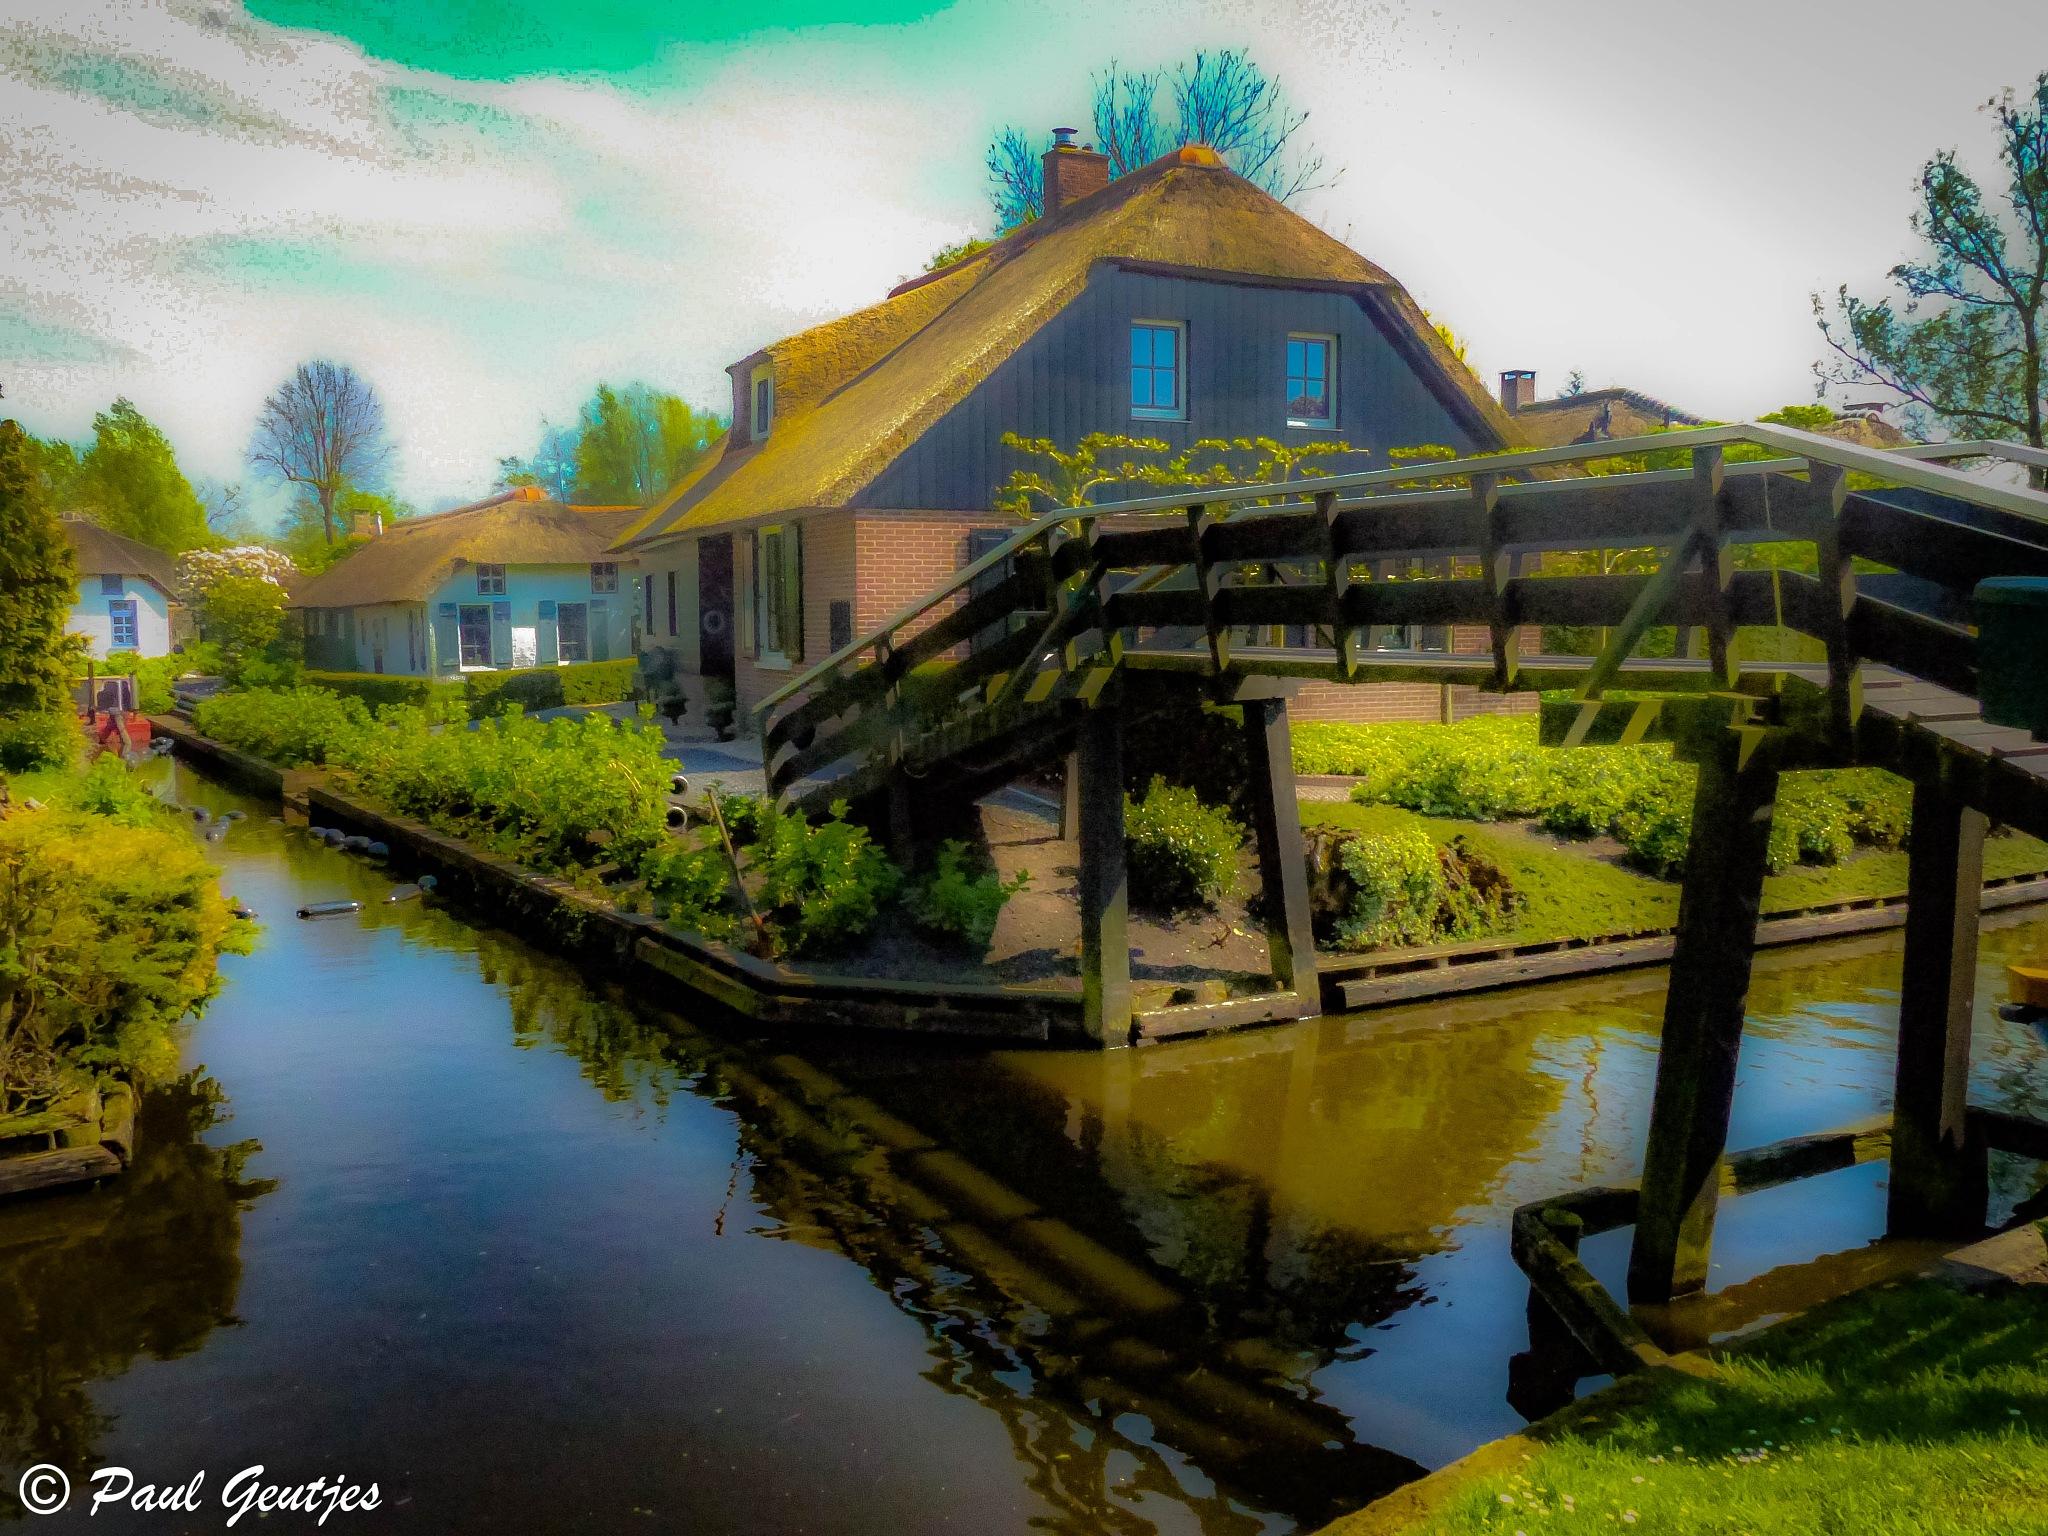 cottage by Paul Geutjes